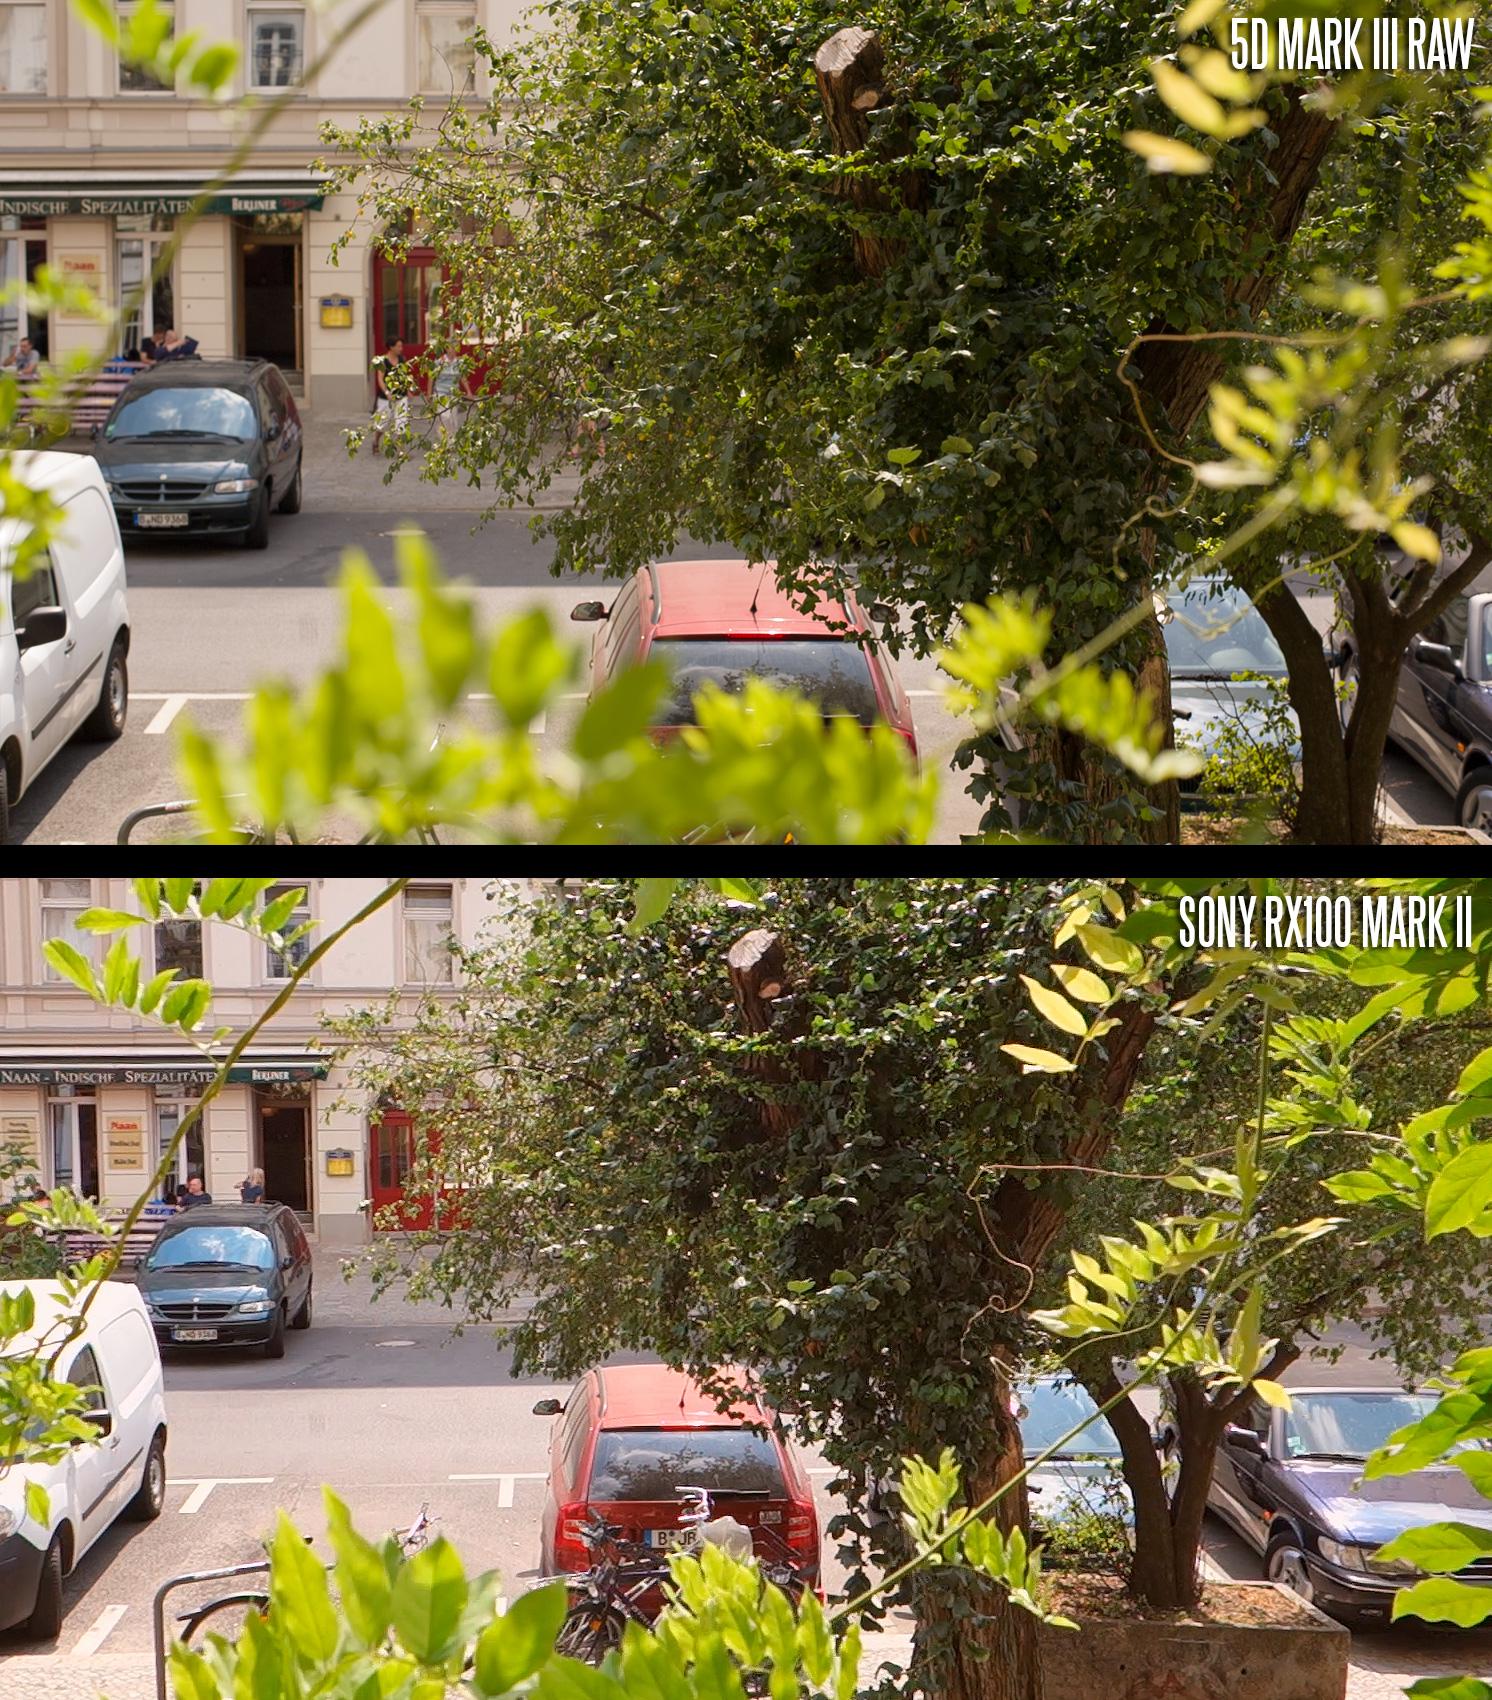 Photoshop :: Reading Canon 5D MK III Raw Files In CS4?